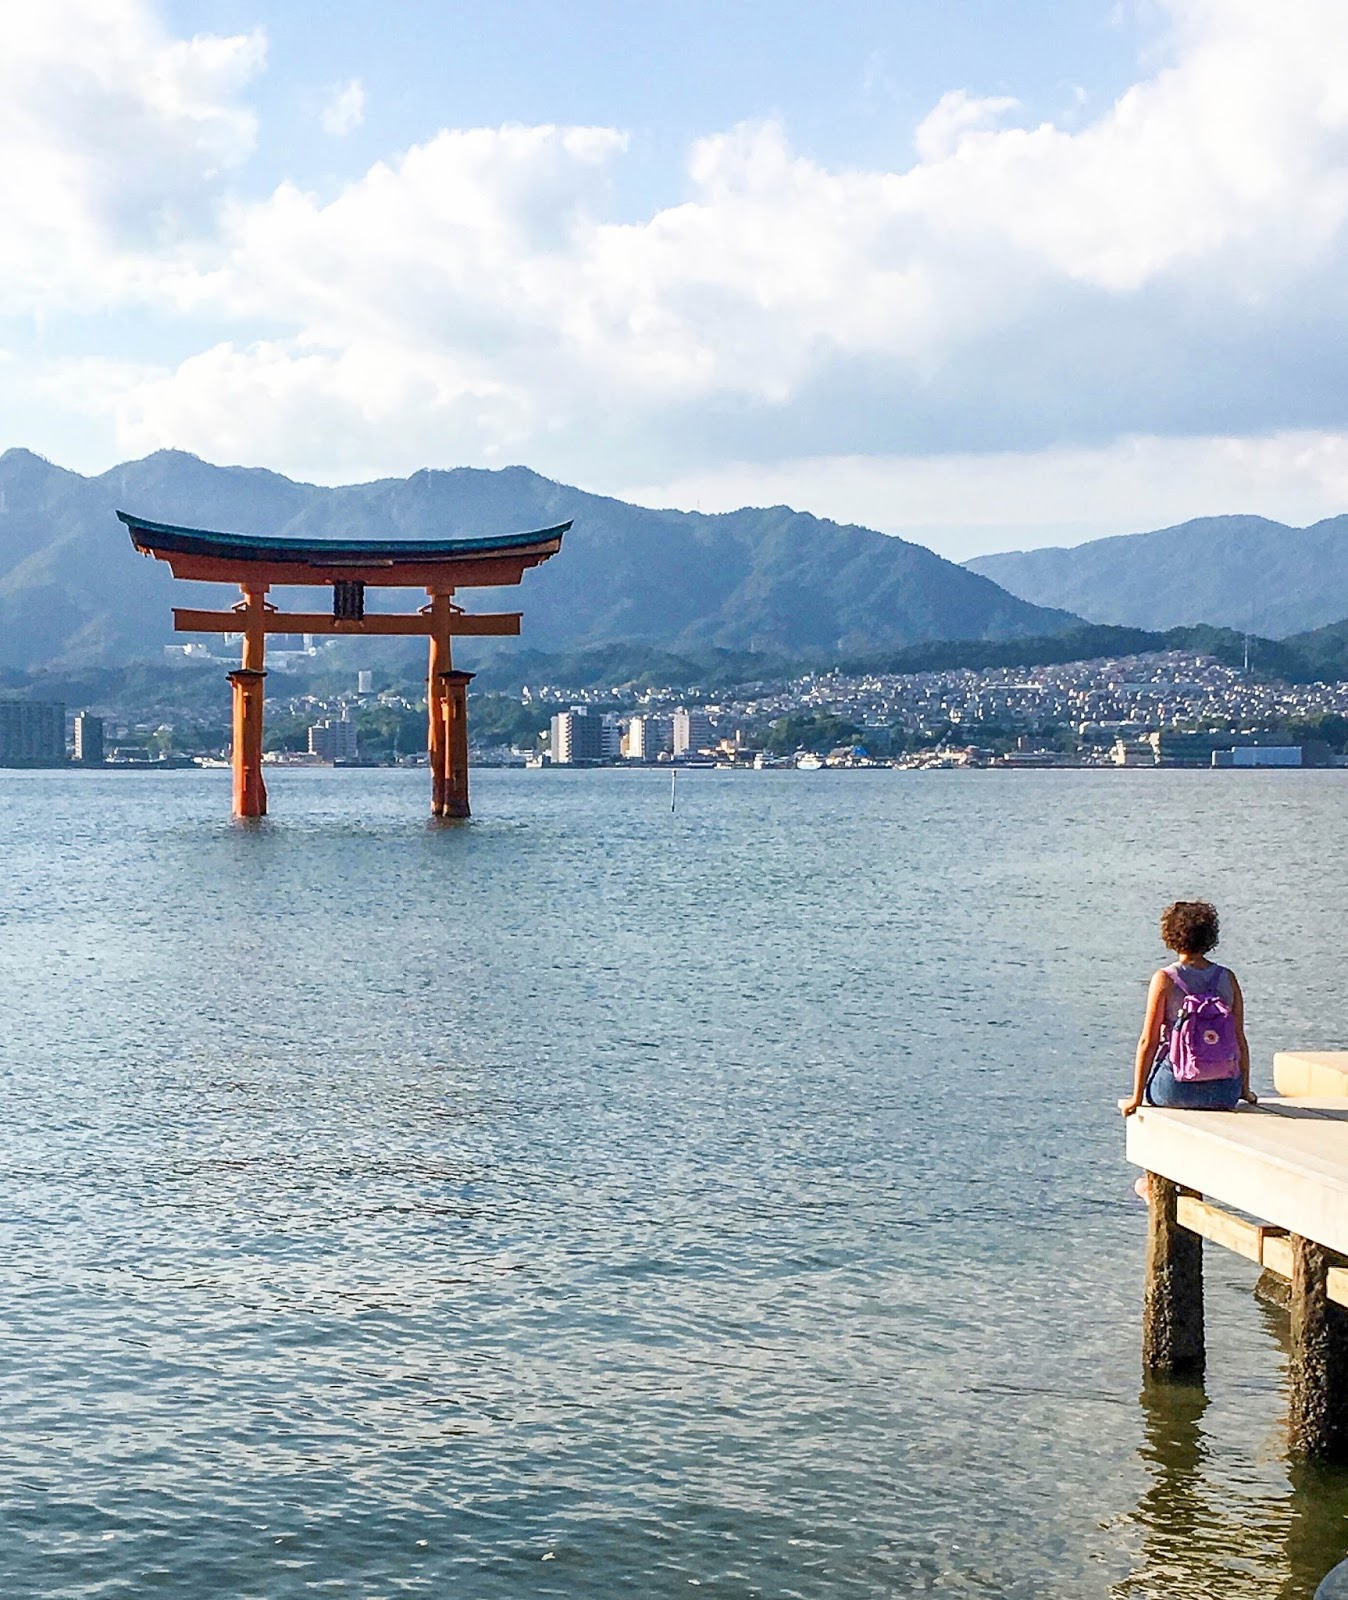 Floating Torii Gate of Miyajima, Japan